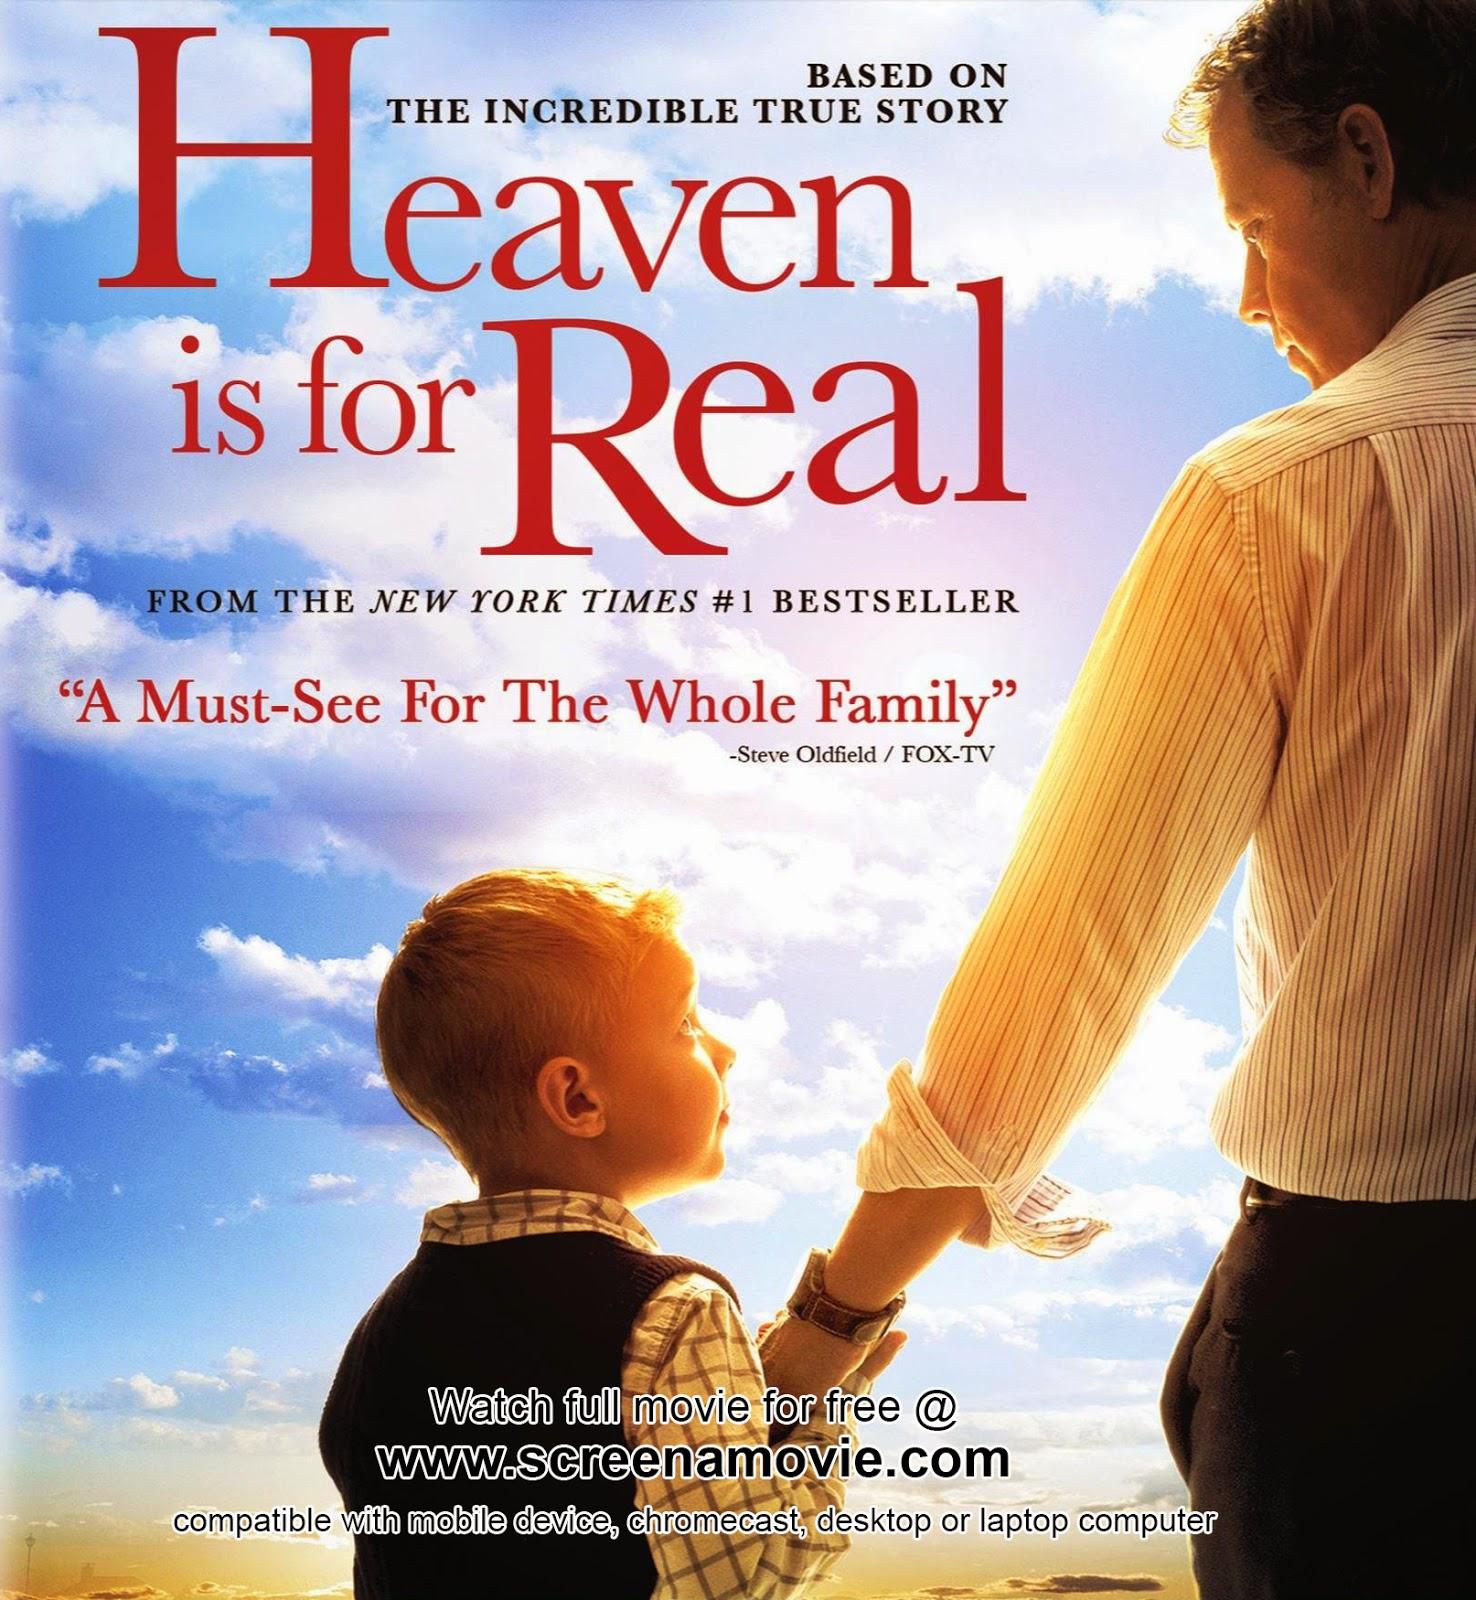 Heaven Is for Real_@screenamovie